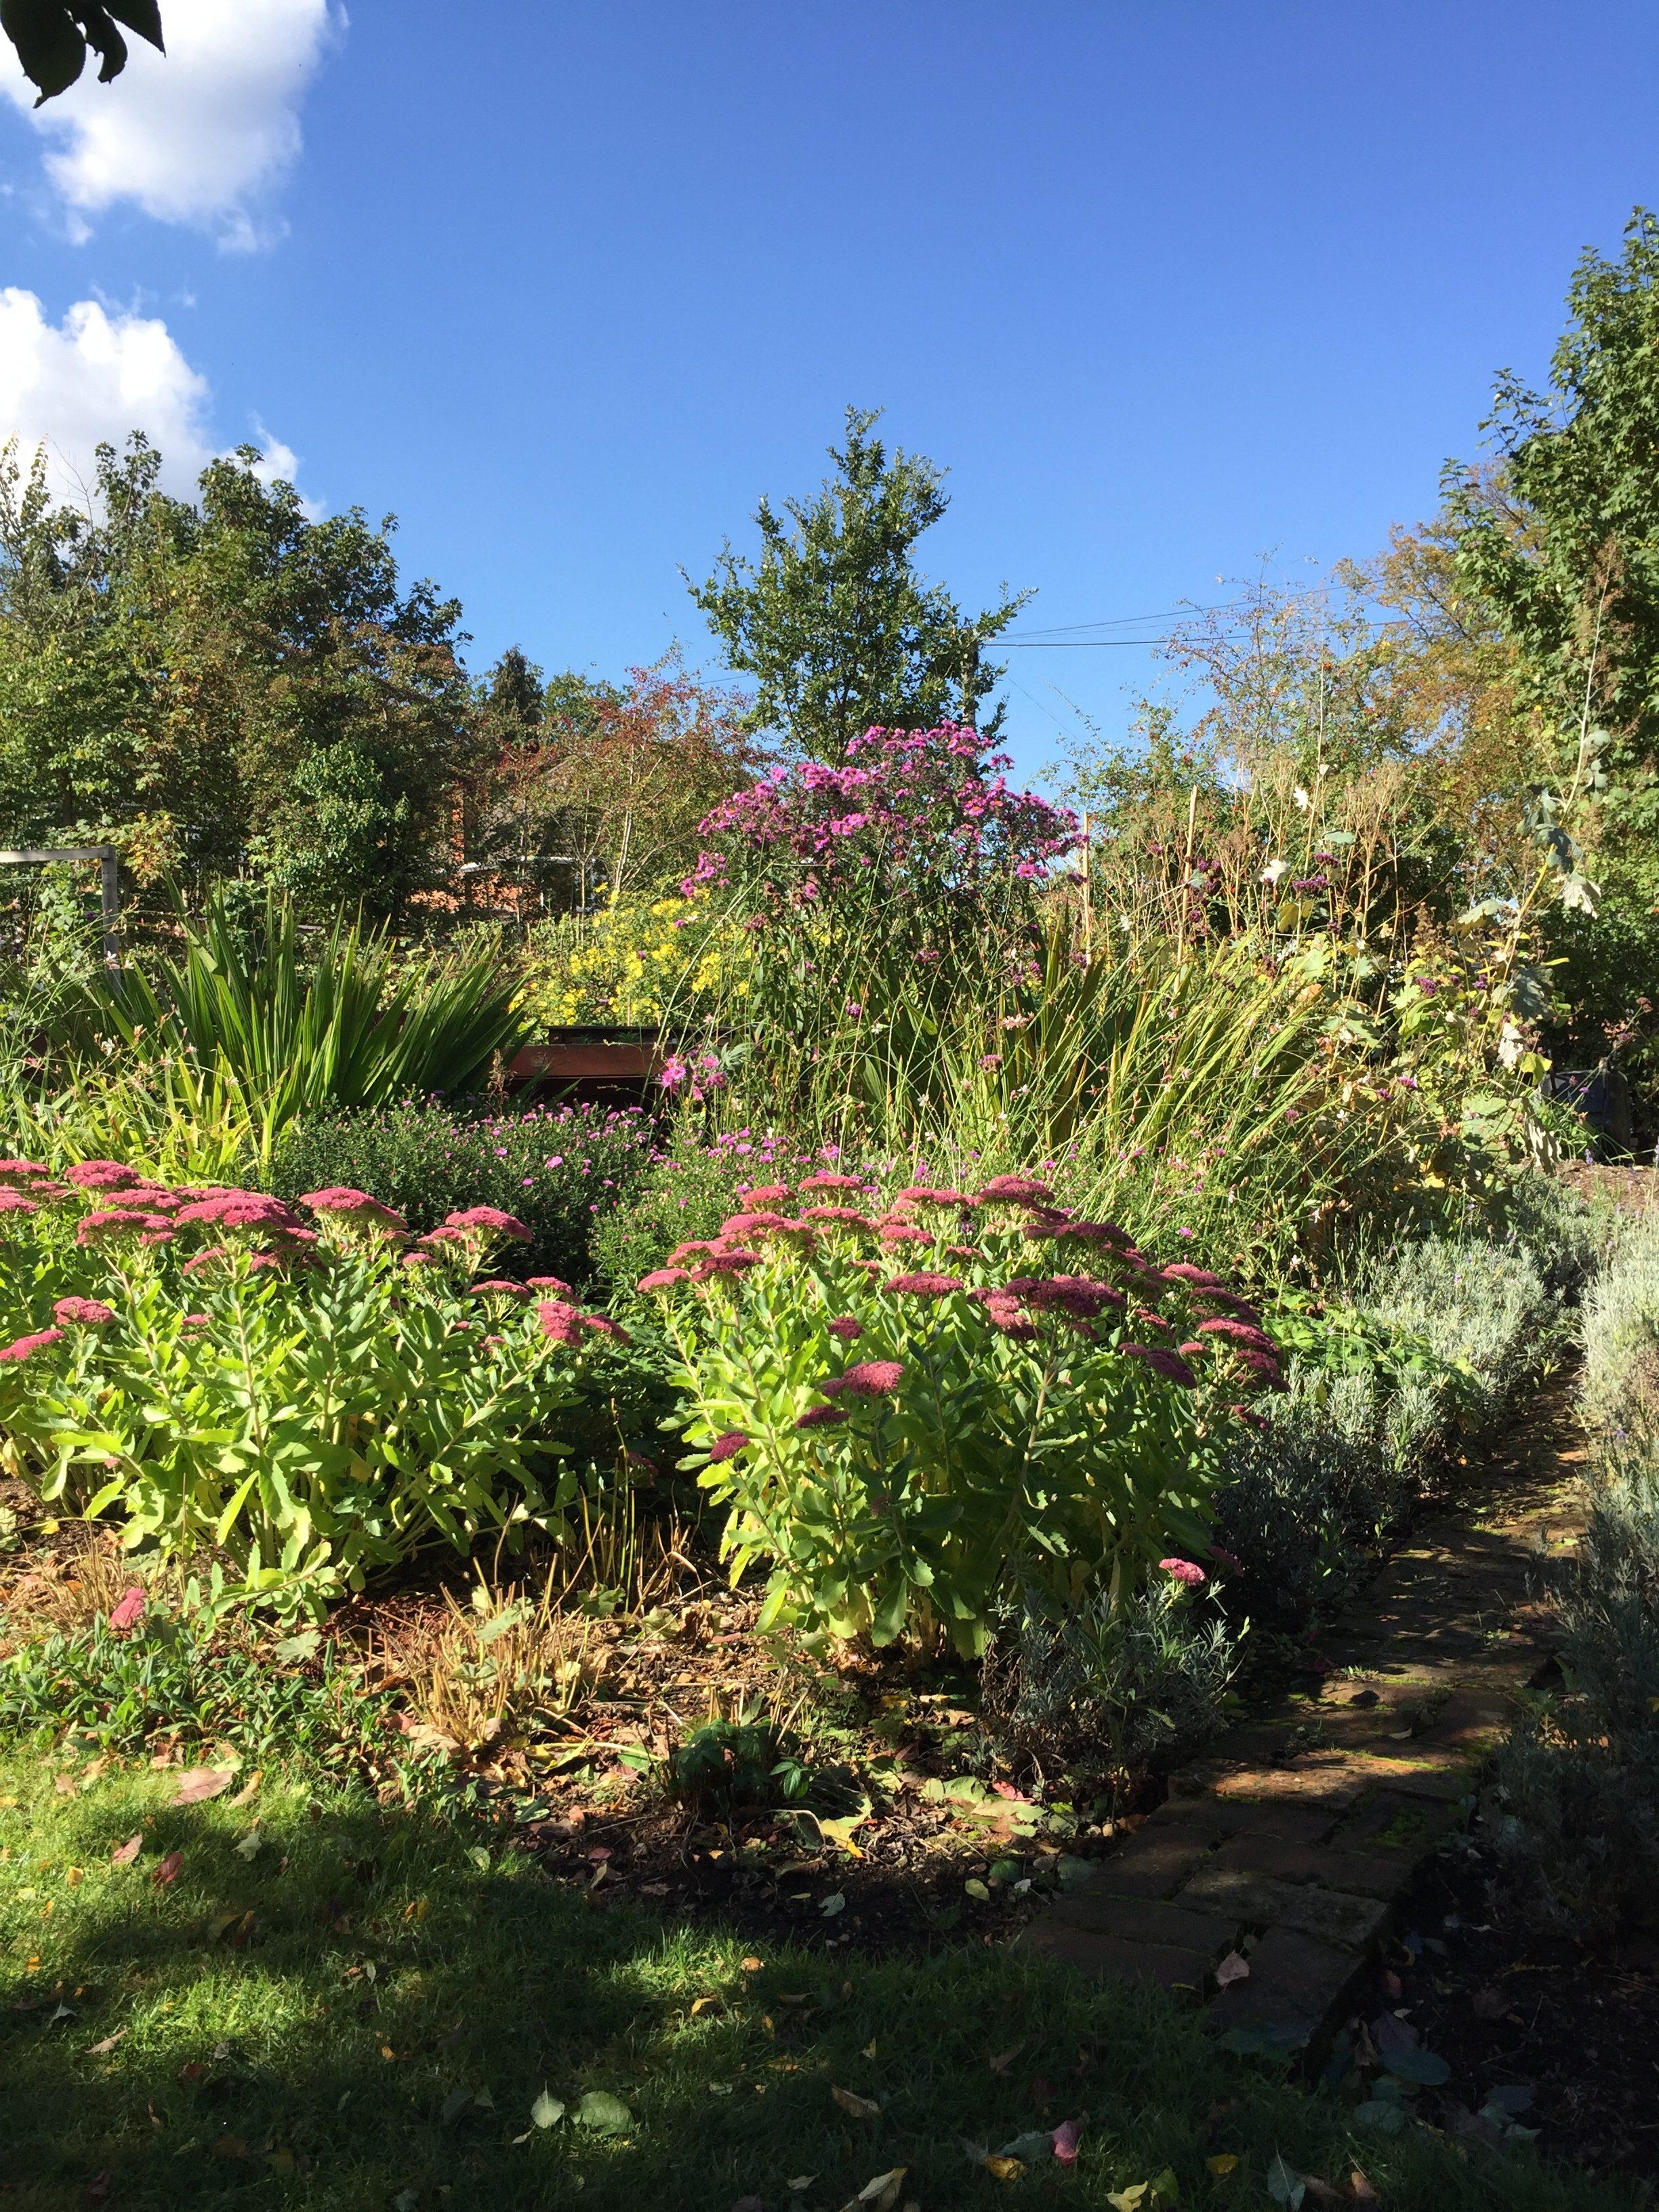 The Ridgeline Trust's Garden Project